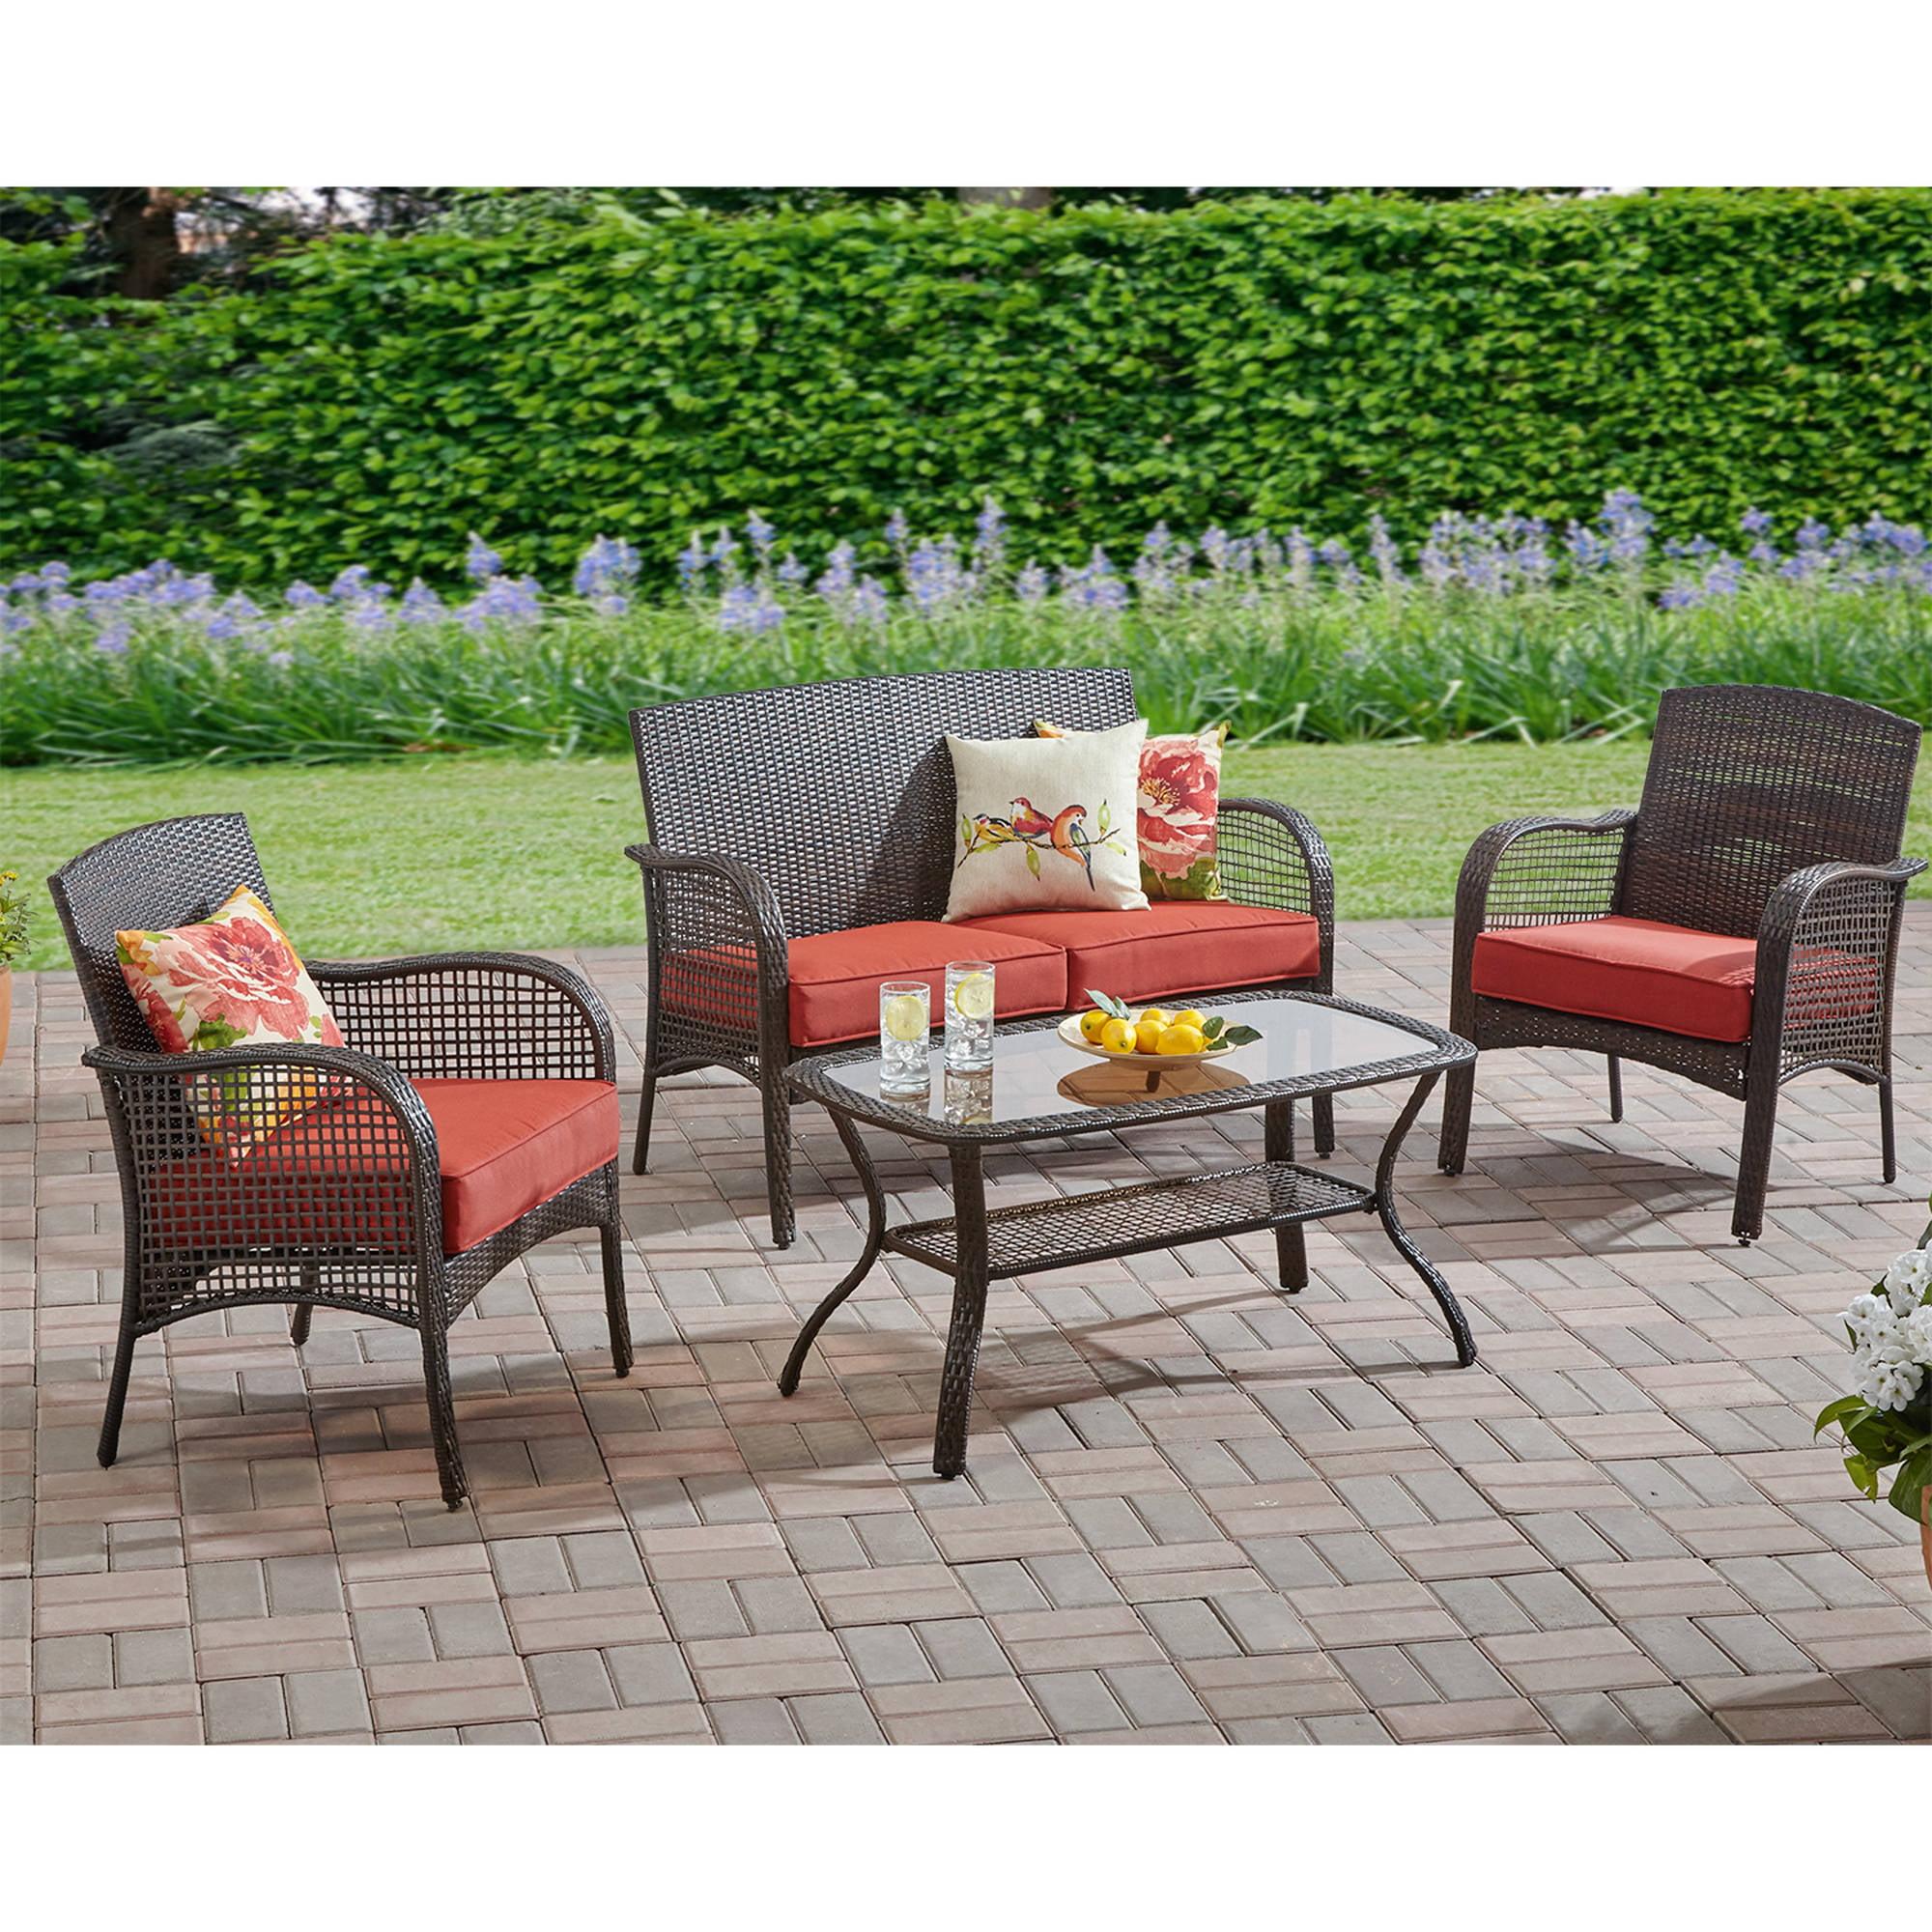 Mainstays Cambridge Park 4-Piece Outdoor Conversation Set, Seats 5